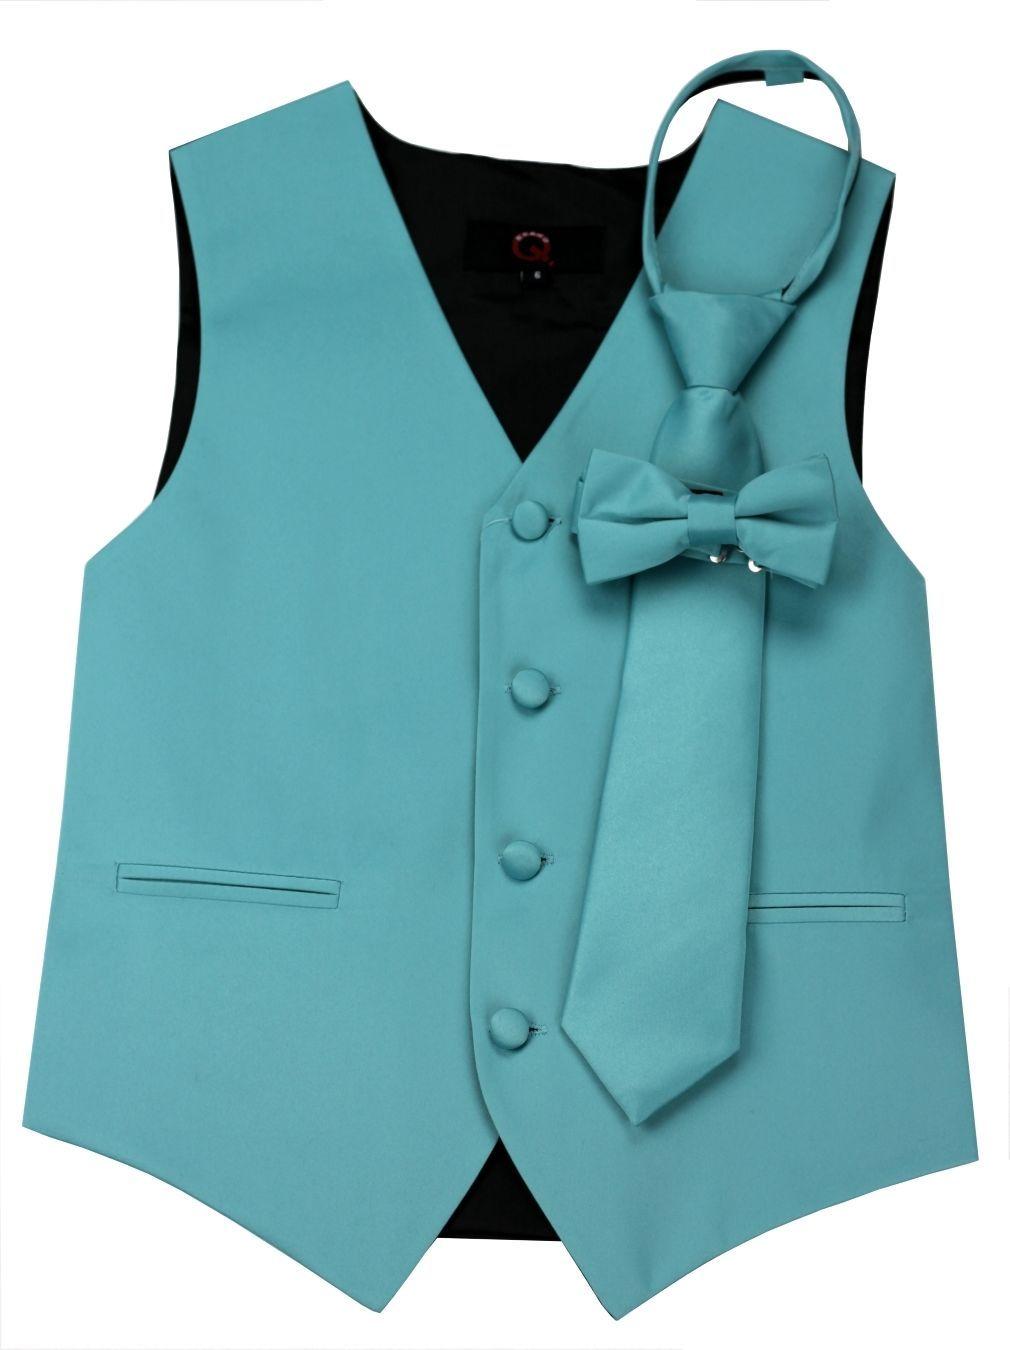 19.25$  Watch now - http://vizfr.justgood.pw/vig/item.php?t=xug4252681 - Sizes: Boy's 4 - Men's 6XL. Italian Design. Teal Tuxedo Vest Set 19.25$